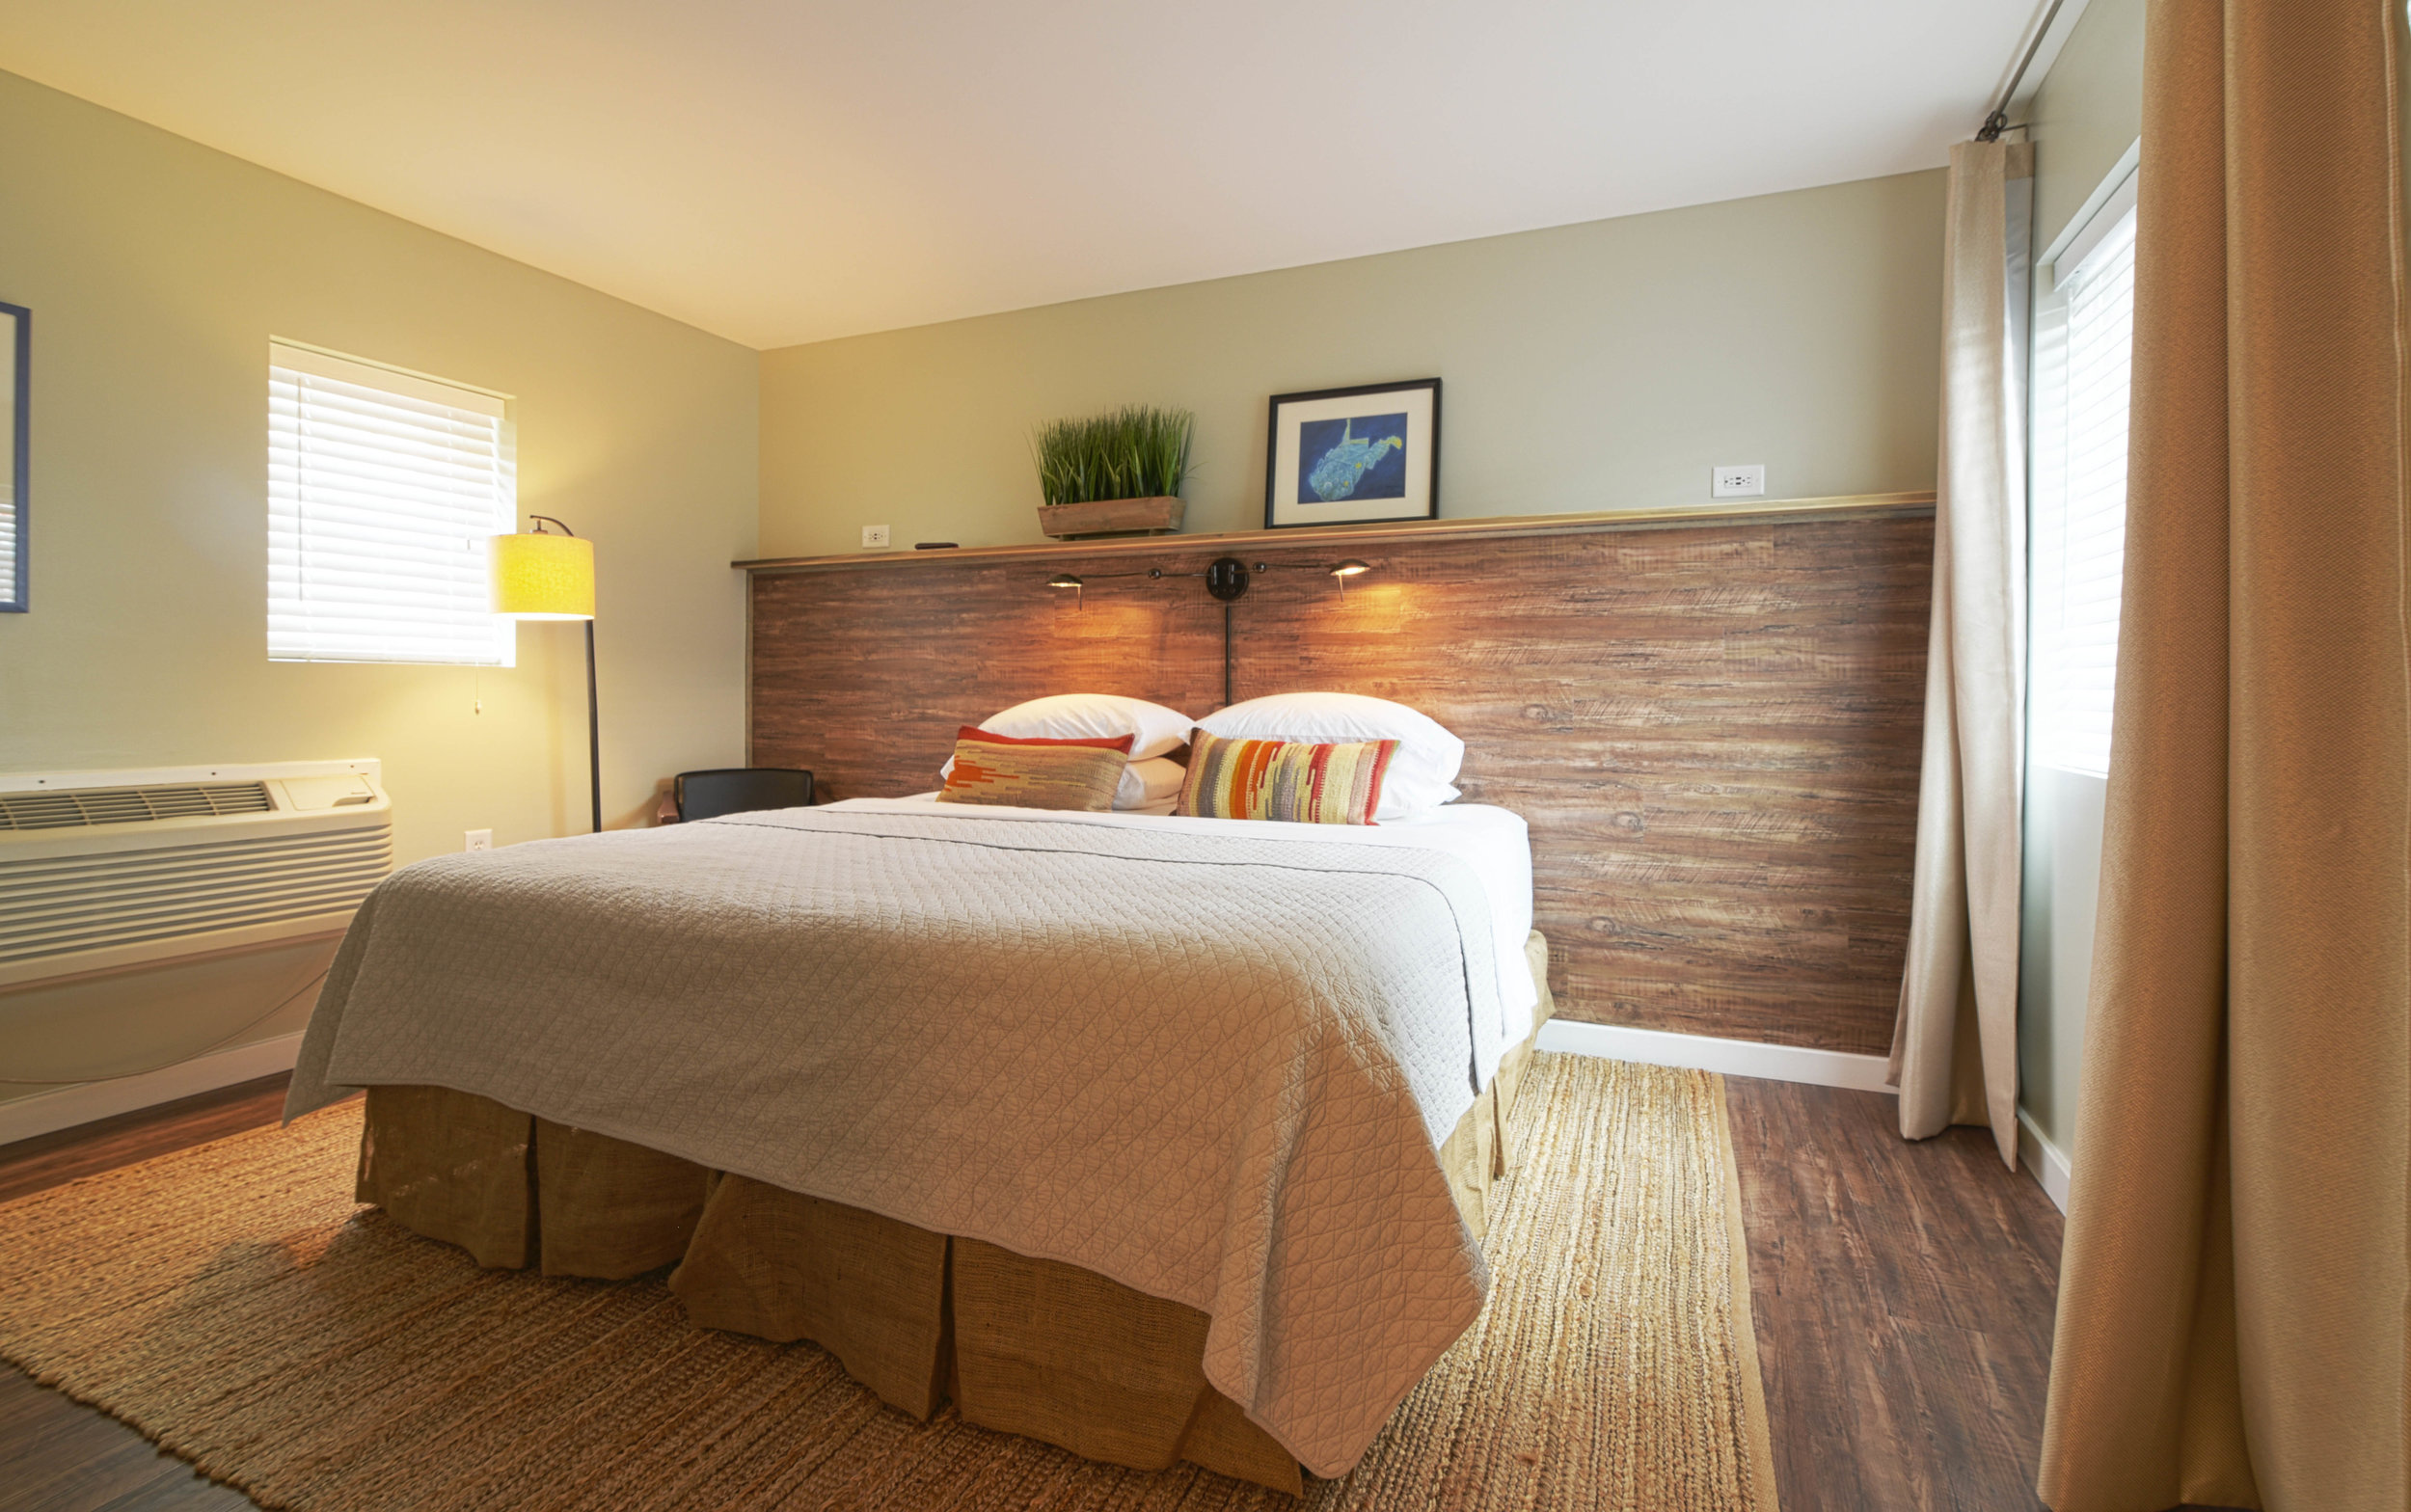 Room4-HDR-2.jpg